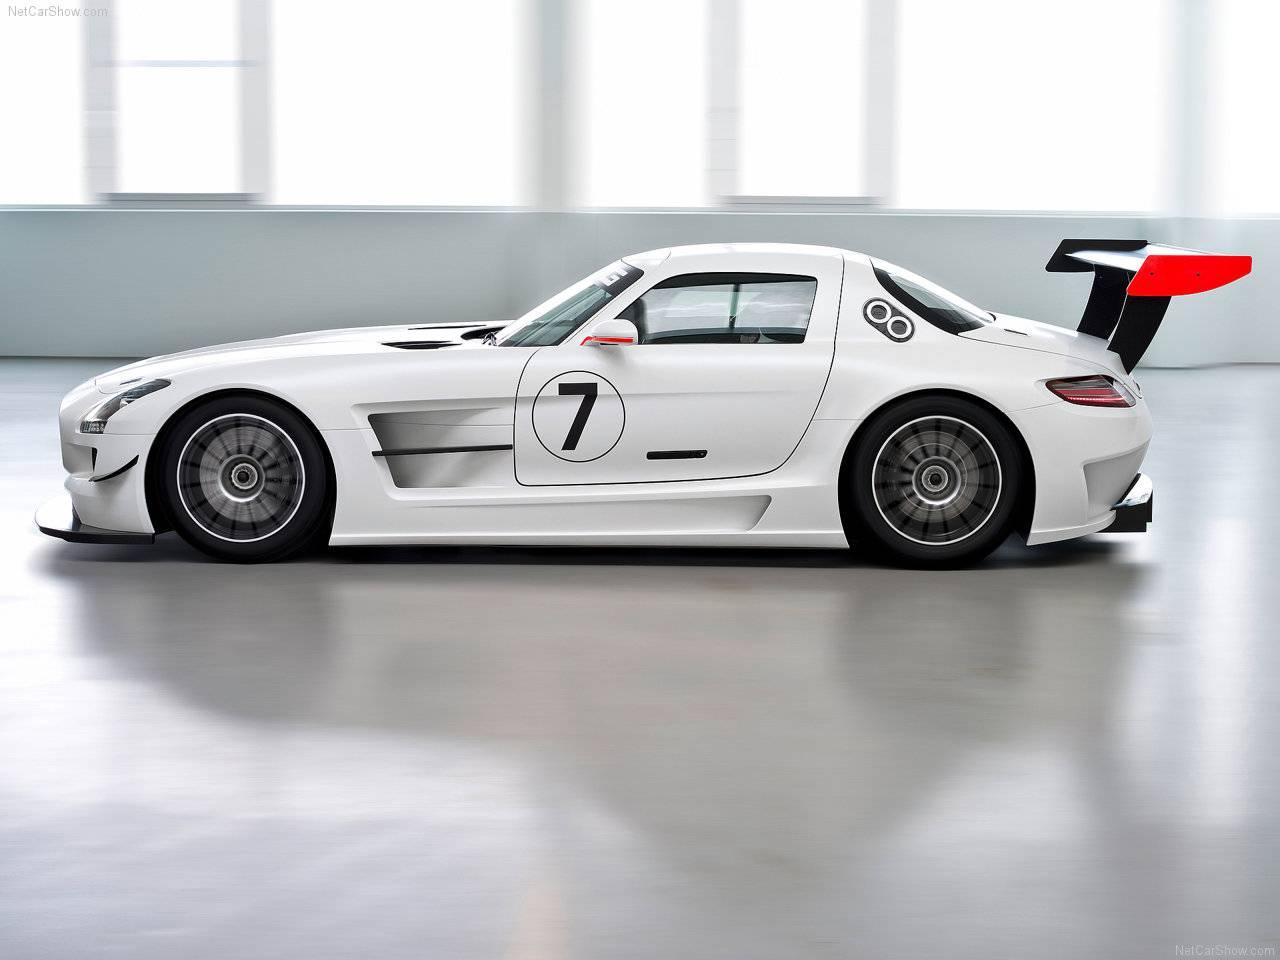 http://2.bp.blogspot.com/_xhqjRo6NERQ/S7DLTyrwQ7I/AAAAAAAAGxk/DaXq03FXB2k/s1600/Mercedes-Benz-SLS_AMG_GT3_2011_1280x960_wallpaper_02.jpg